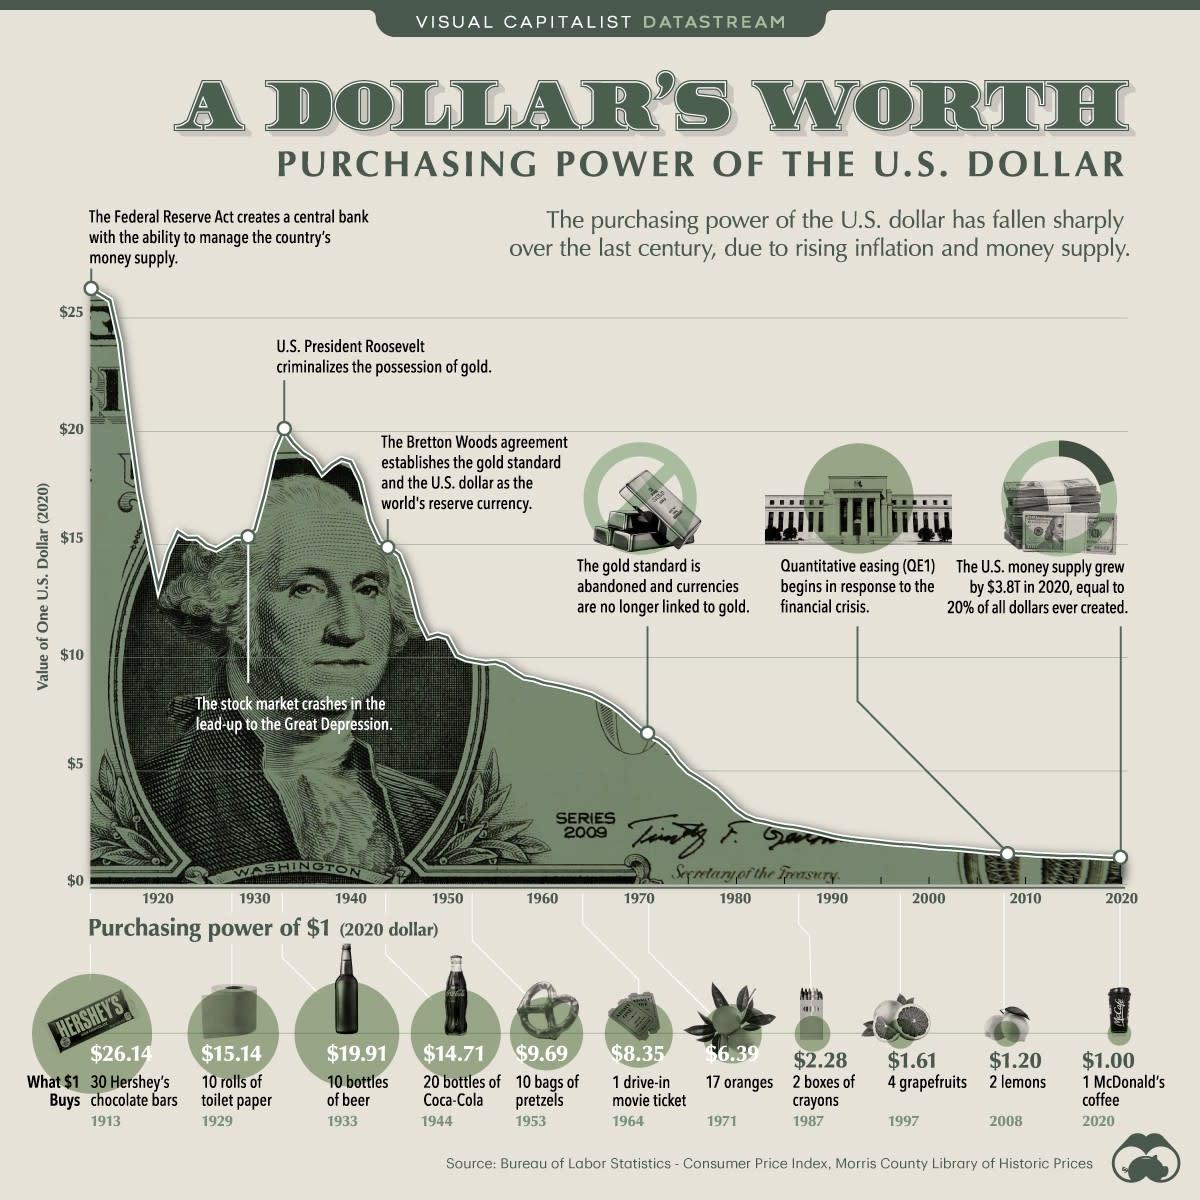 A Dollar's Worth (Source: Visual Capitalist)